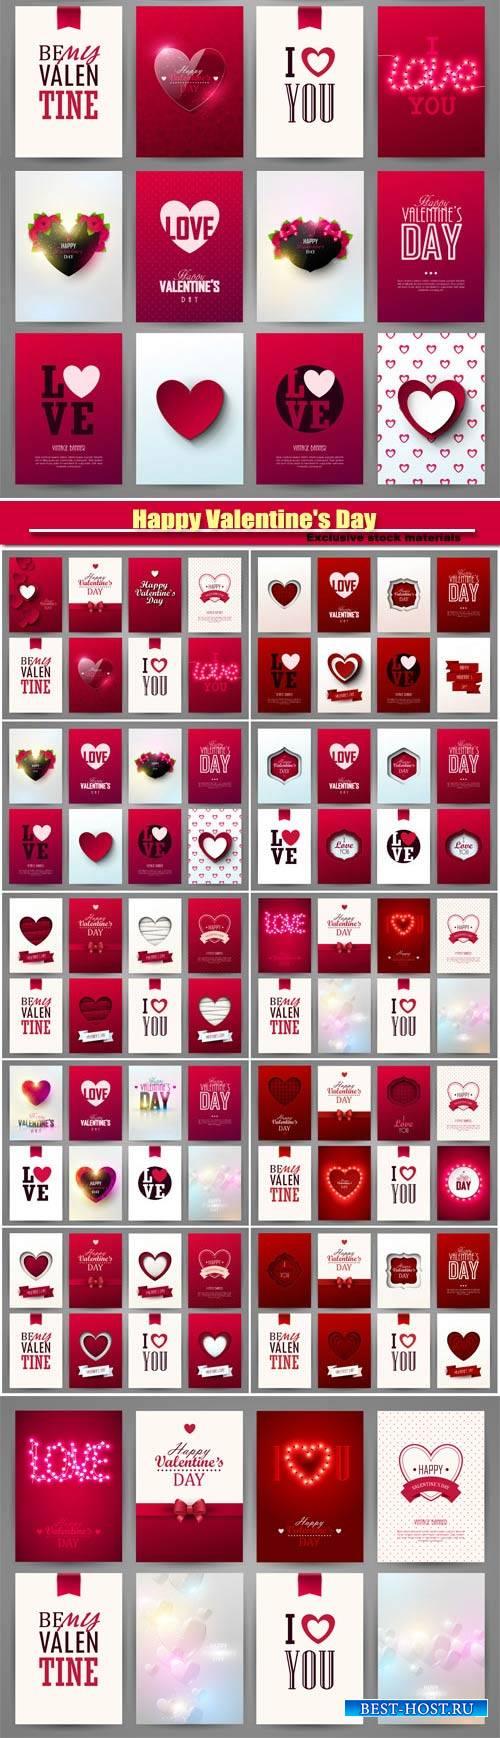 Happy Valentine's Day vector, hearts, romance, love #25